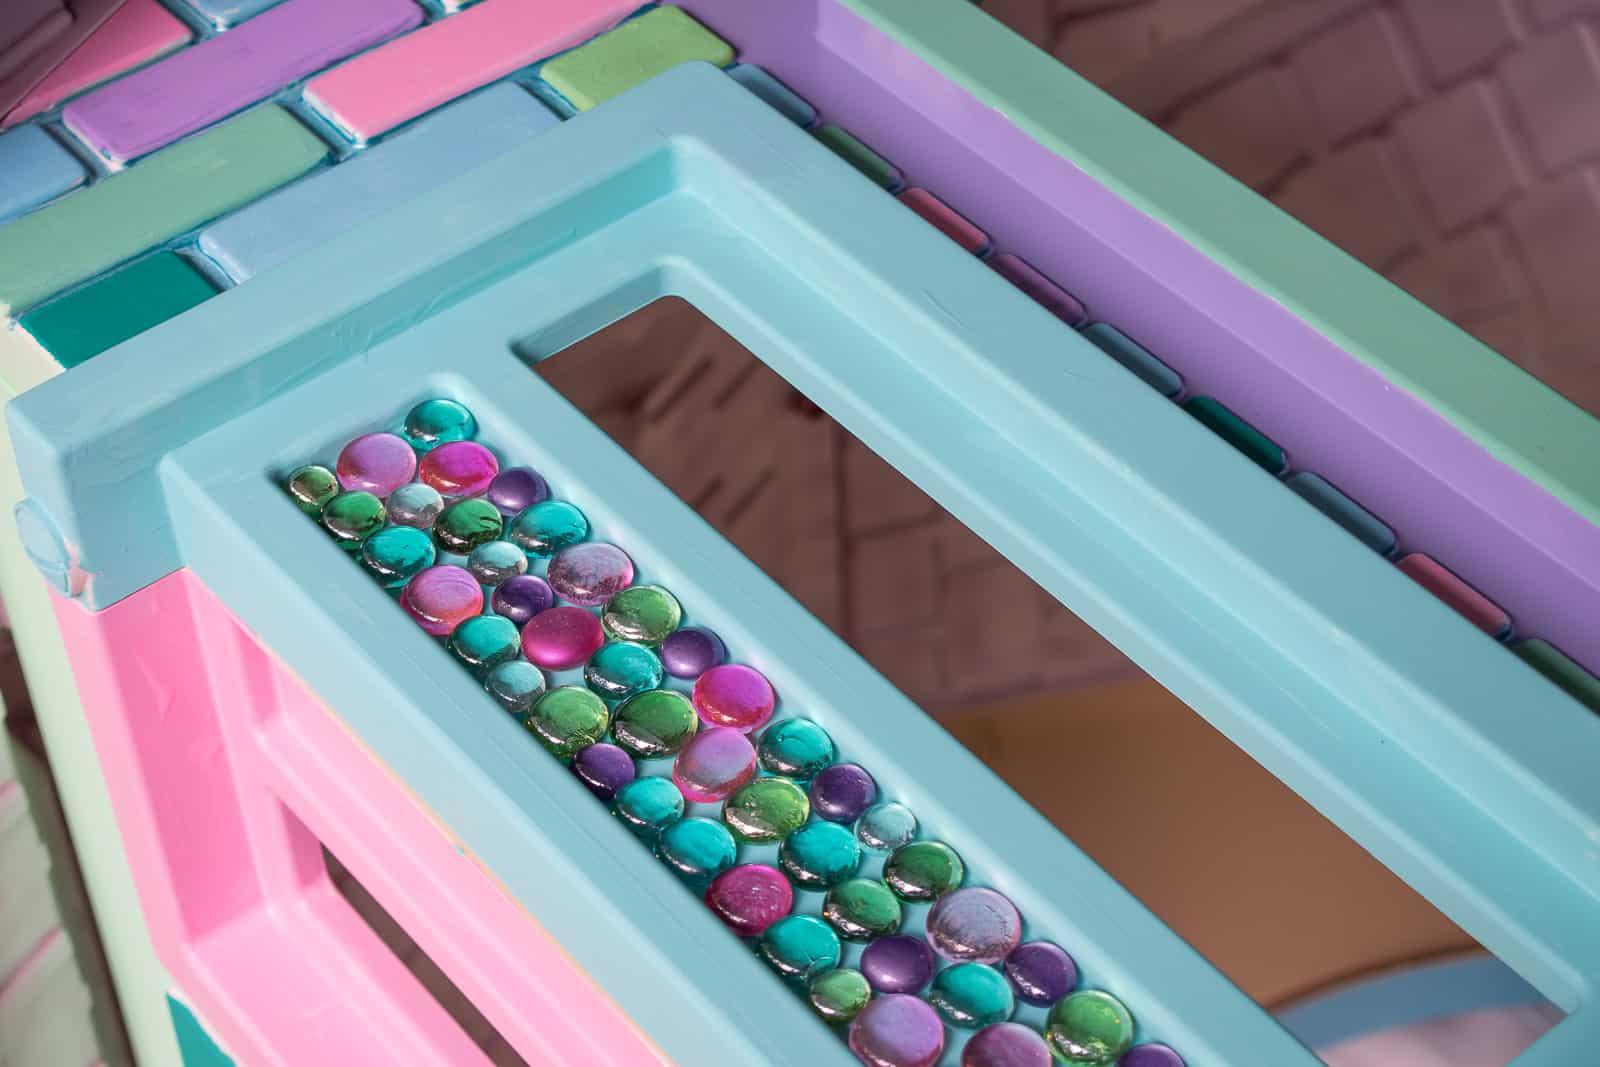 glued glass beads